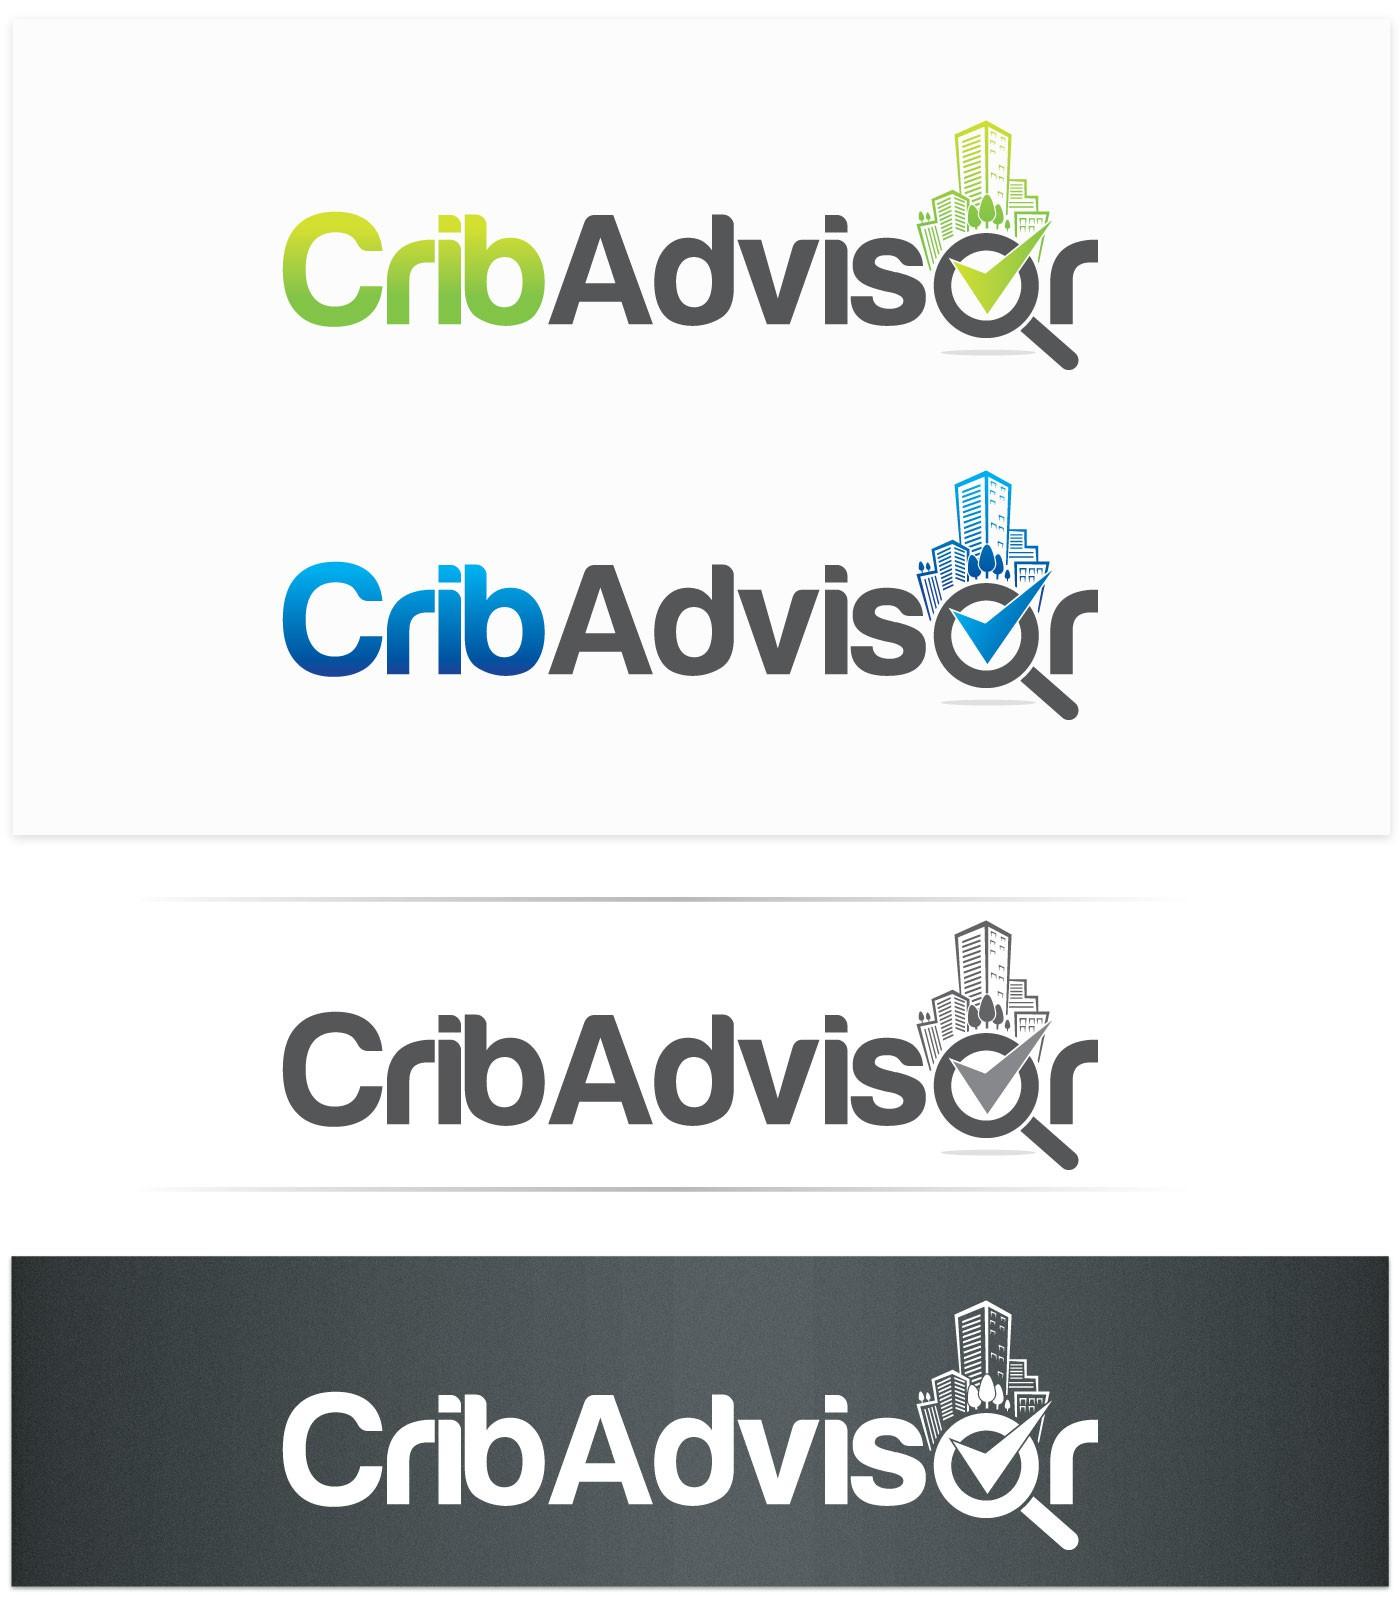 New logo wanted for CribAdvisor